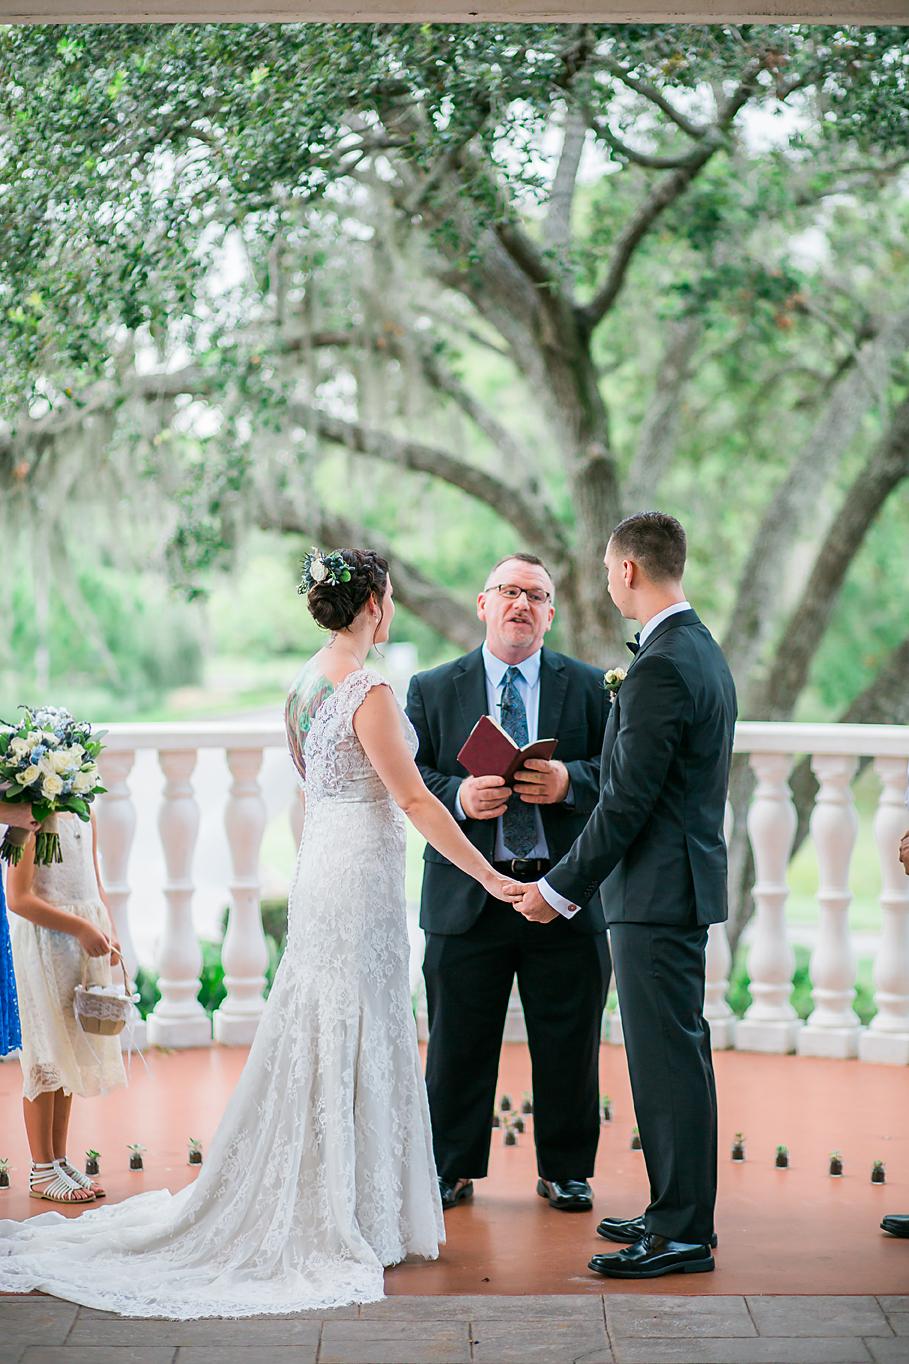 Kayla + Jesse - Tampa Wedding Photography - East Lake Woodland's Country Club Wedding Photographer - Emily & Co. Photography  (26).jpg